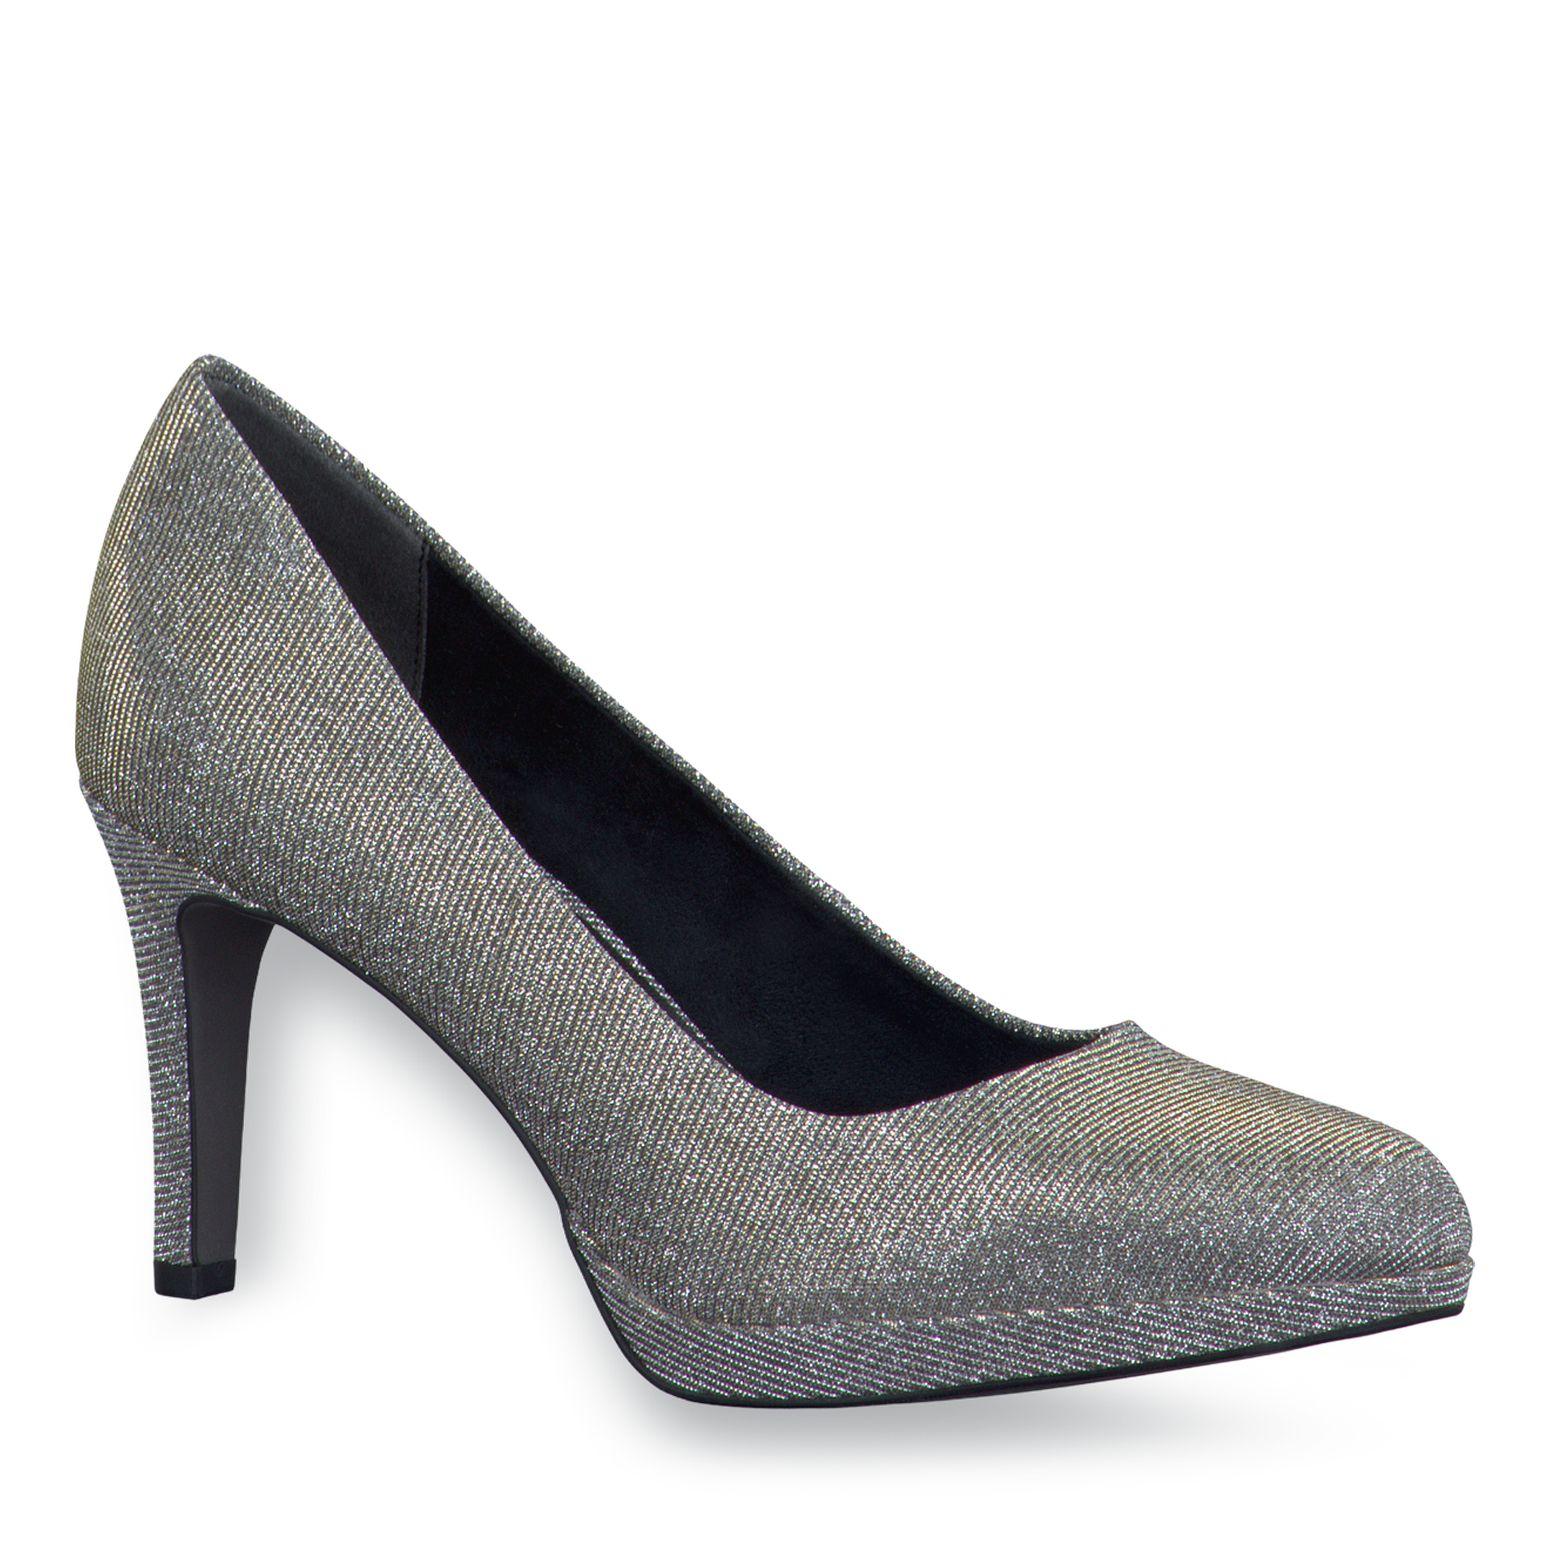 yam 1 1 22446 27 tamaris high heels online kaufen. Black Bedroom Furniture Sets. Home Design Ideas